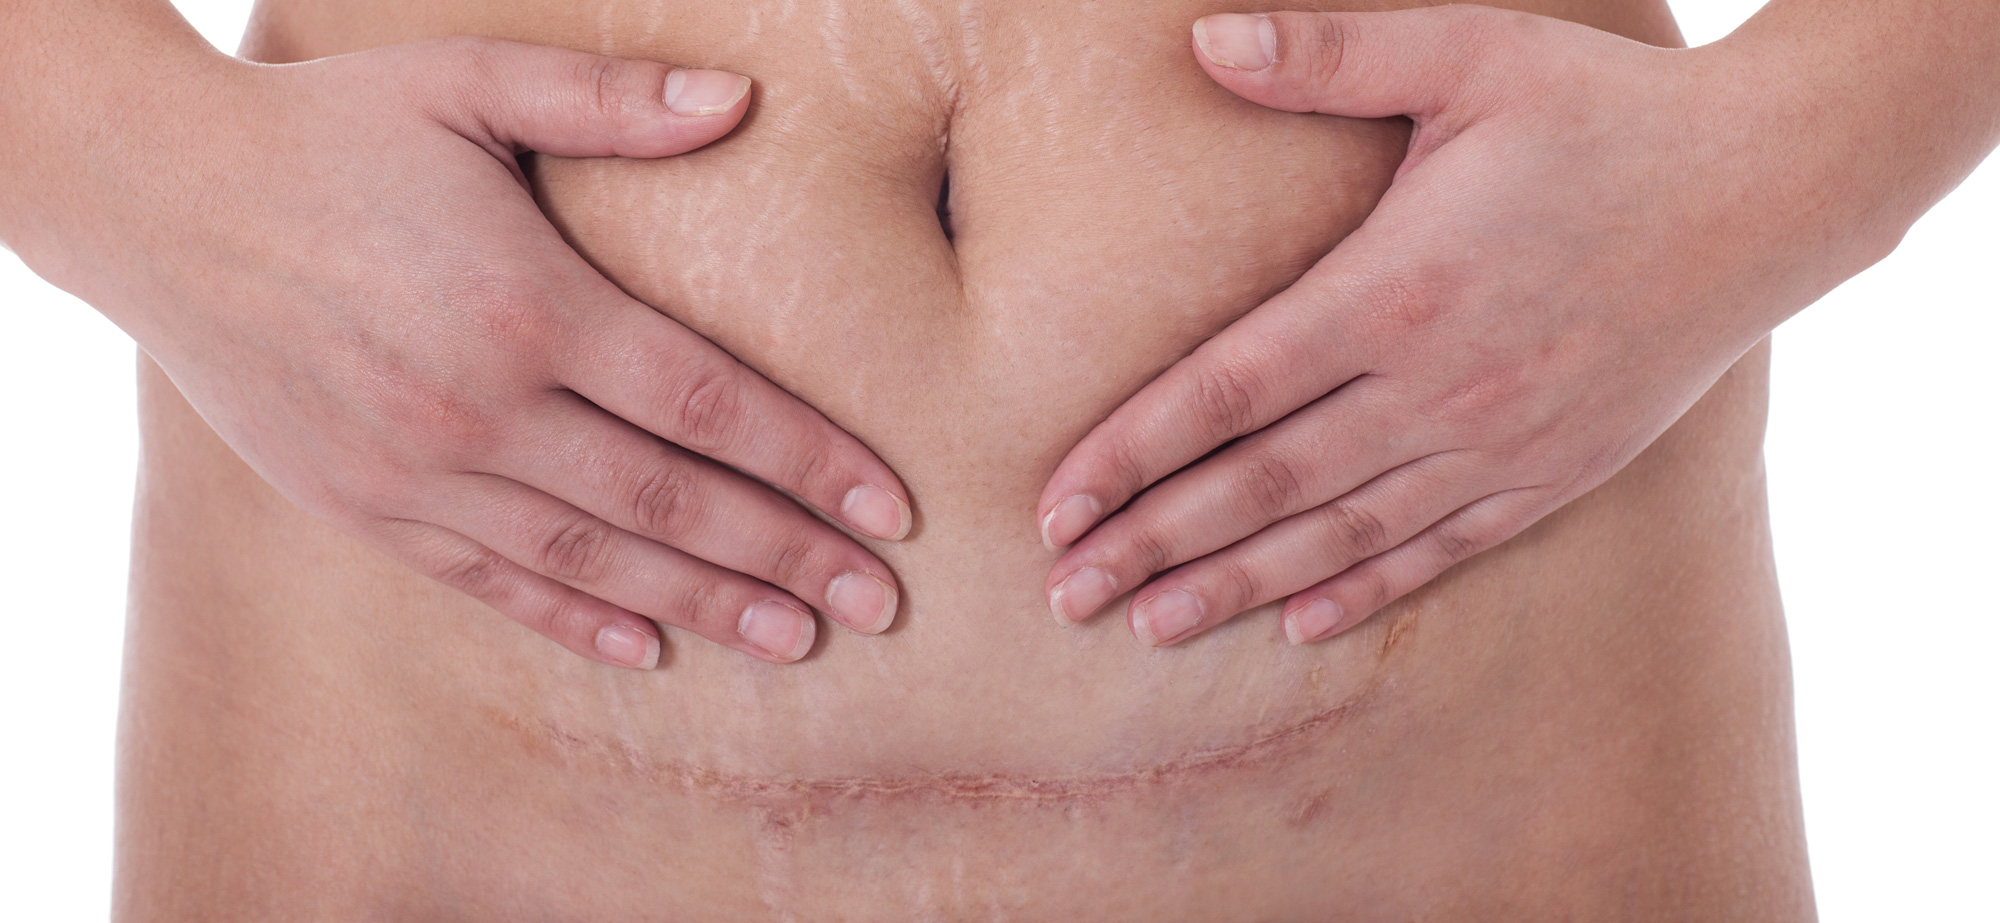 Tratamento a laser de cicatrizes ginecológicas